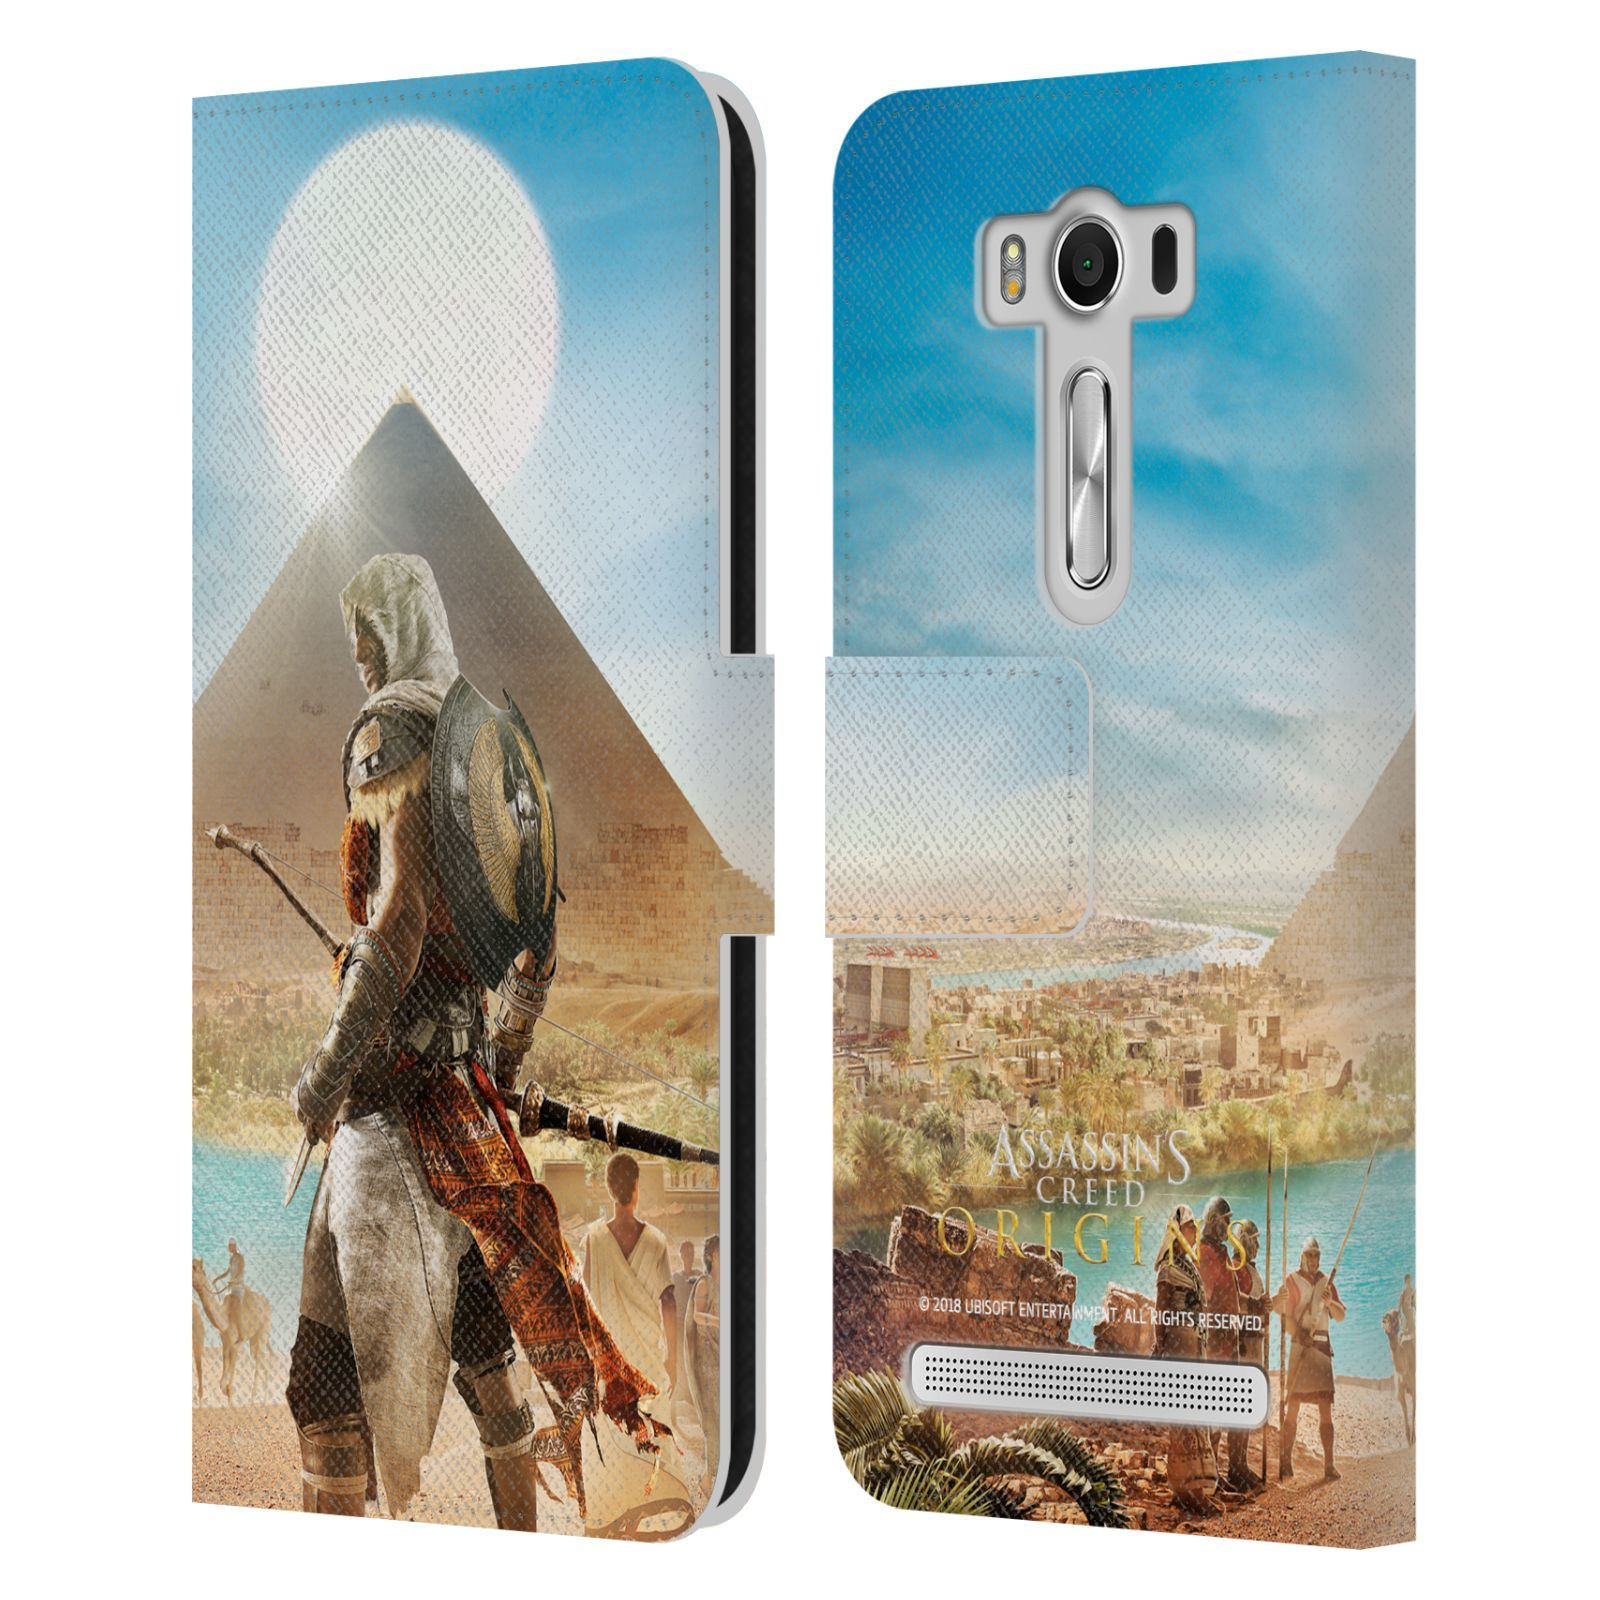 Pouzdro na mobil Asus Zenfone 2 Laser ZE500KL - Head Case - Assasins Creed Origins Bayek pyramida